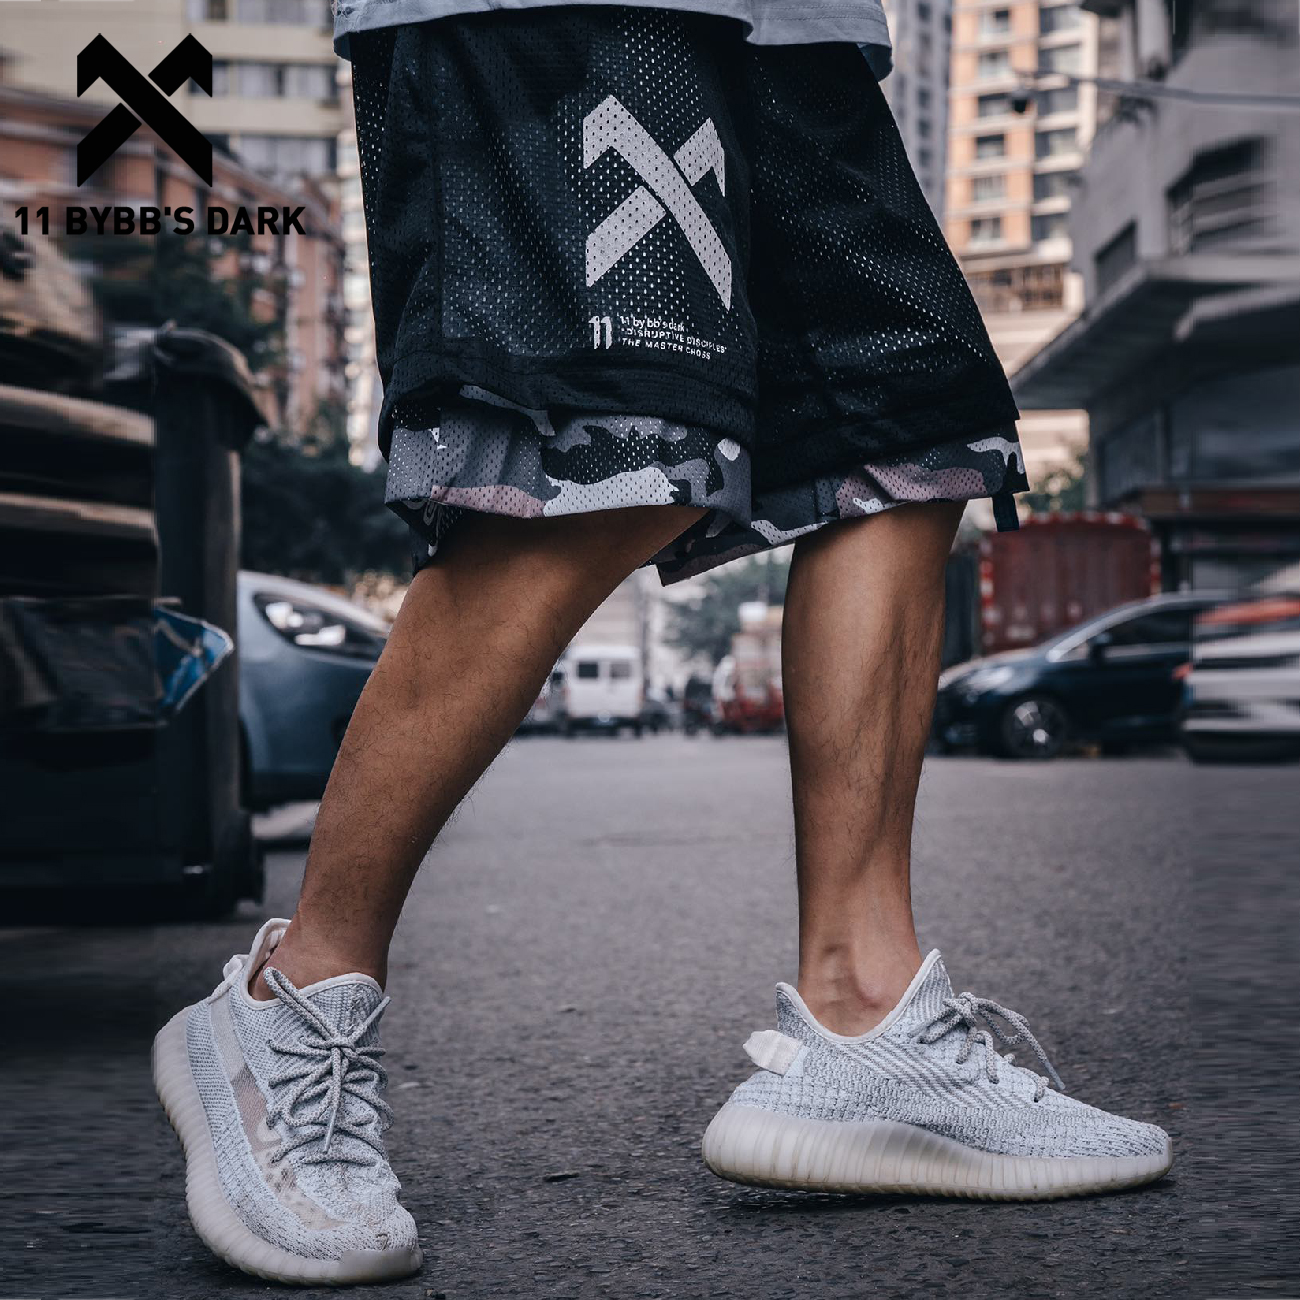 11 BYBB DARK Hip Hop Cargo Shorts Men 2020 Summer Reversible Streetwear Camouflage Shorts Mens Knee Length Joggers Sweatpants